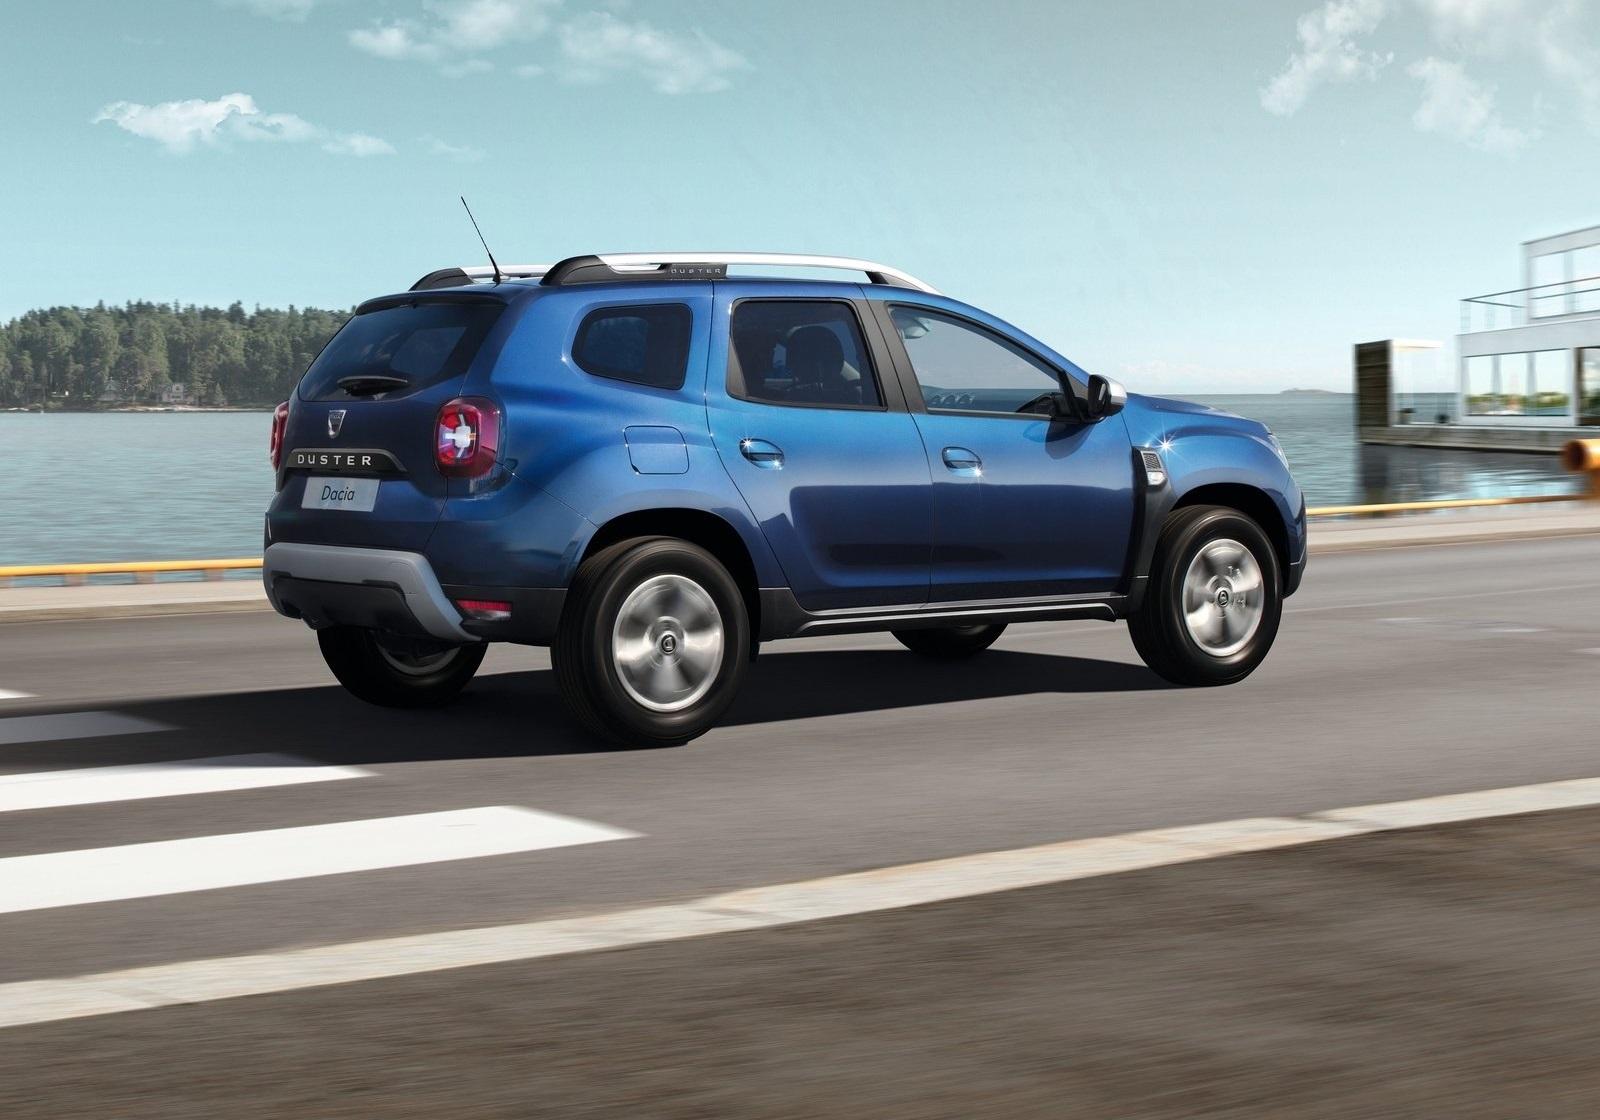 Dacia Duster Eco G Glp (2)